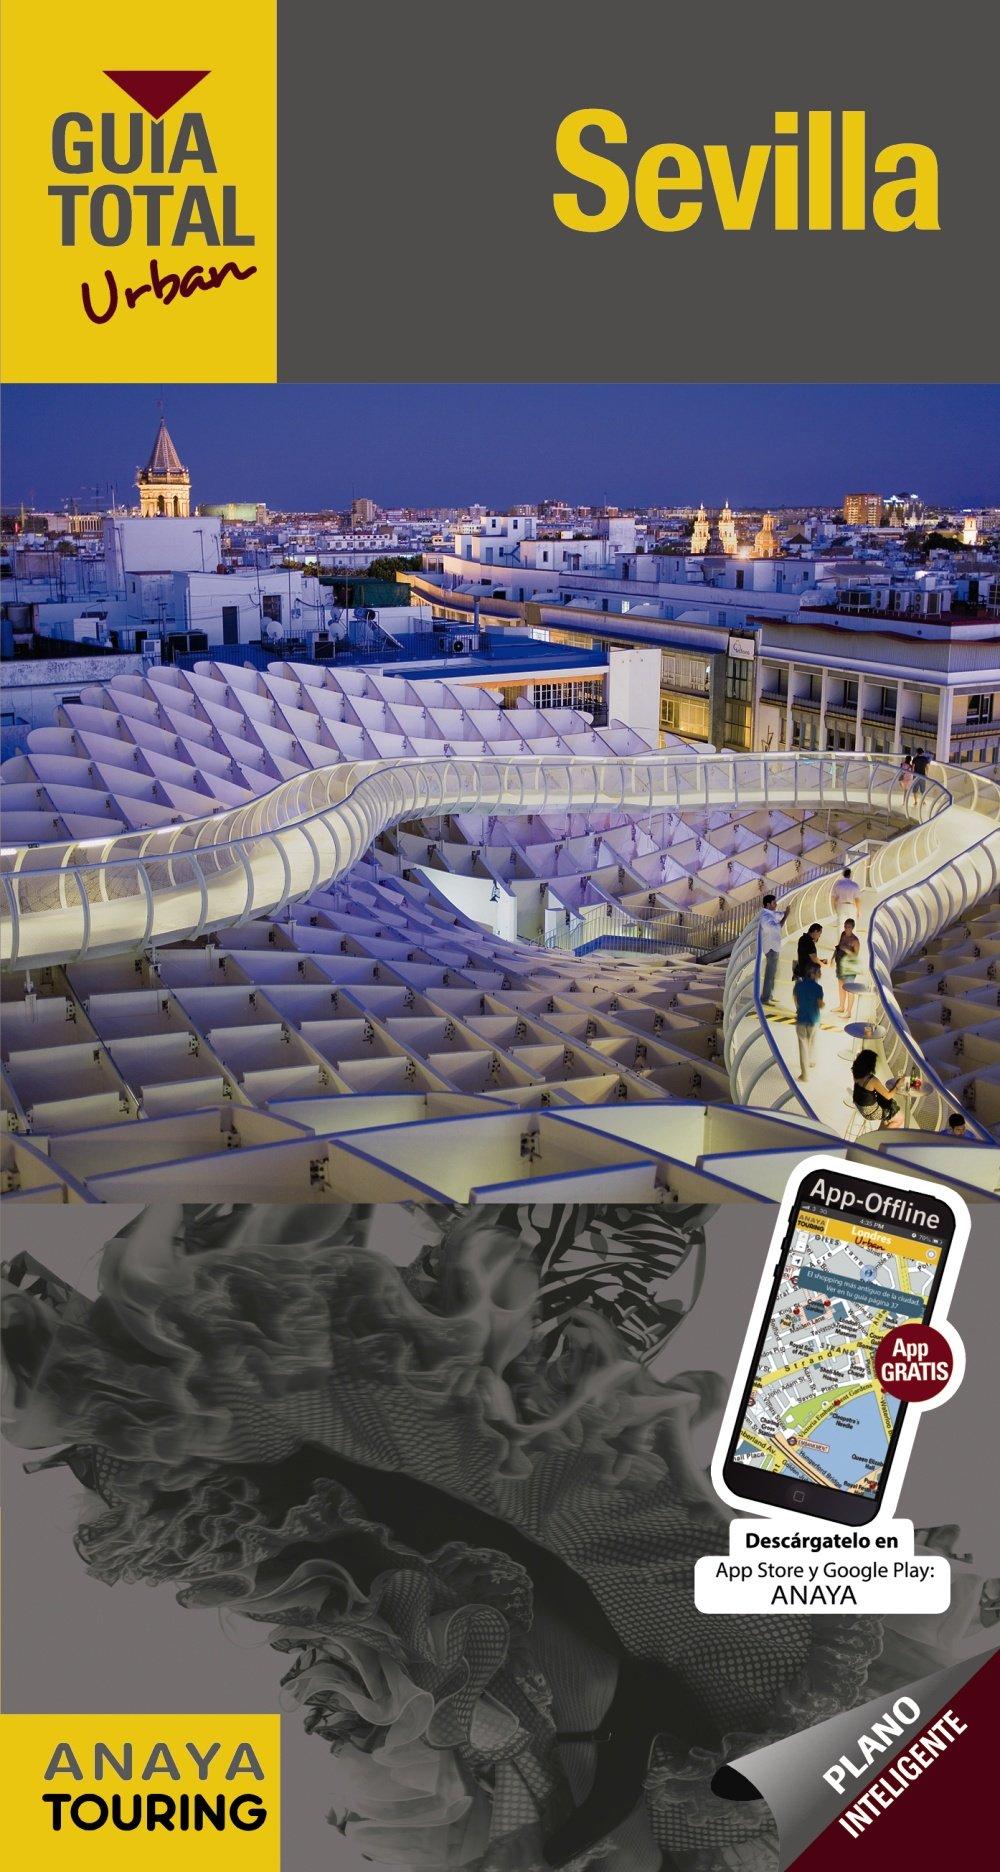 Sevilla (Urban) (Guía Total - Urban - España): Amazon.es: Anaya Touring, Arjona Molina, Rafael, Wals, Lola: Libros